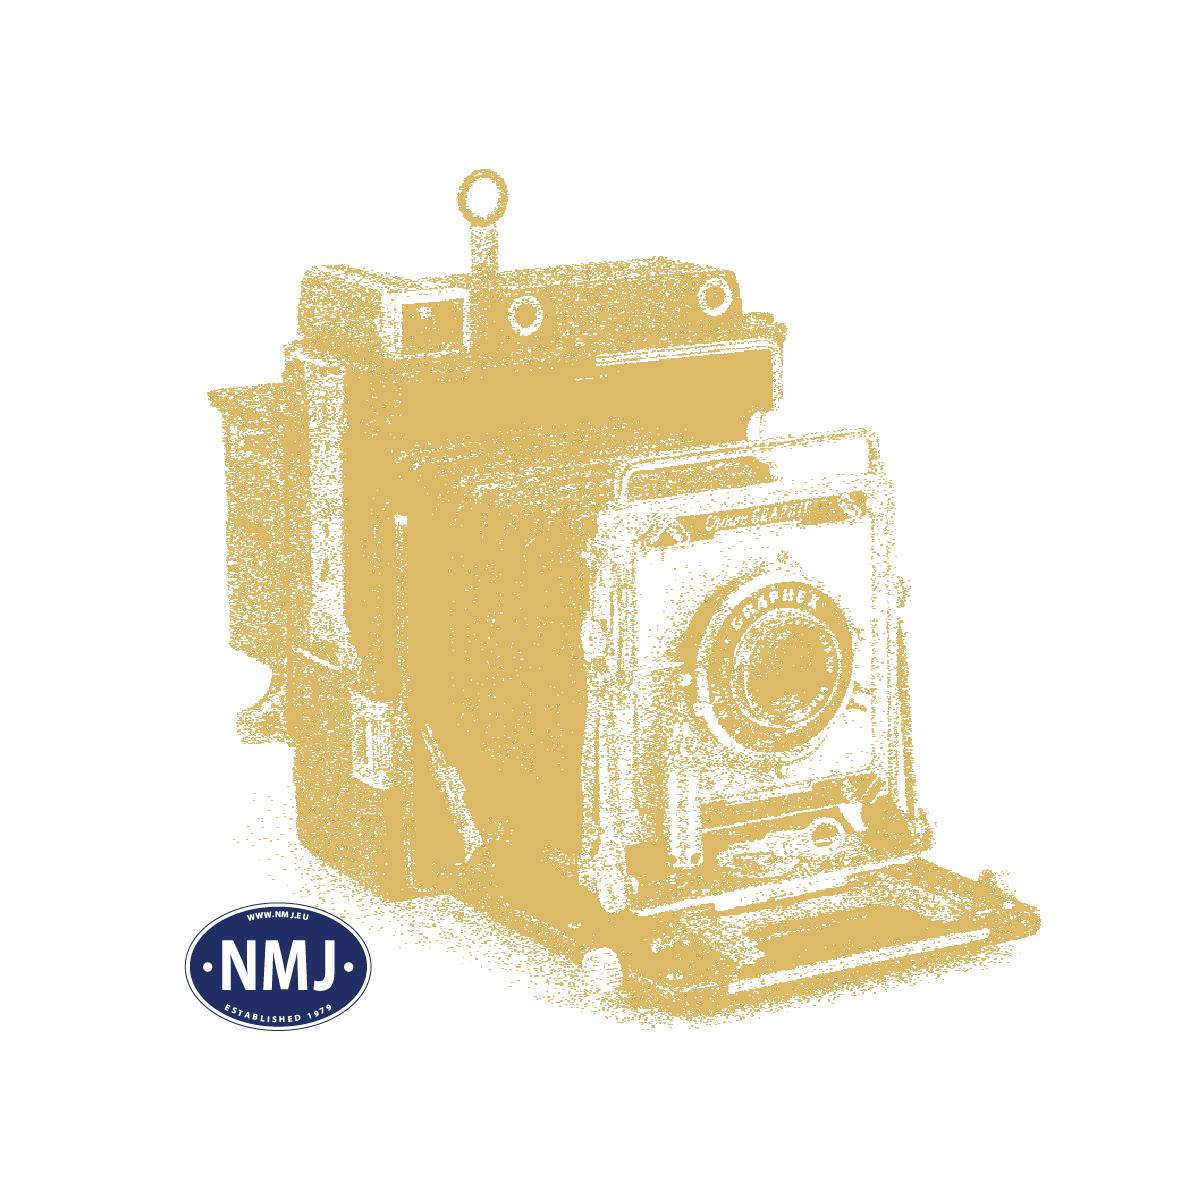 NMJT502.304 - NMJ Topline Kbps 21 76 335 3 742-8 Rungenwagen NSB mit Beladung